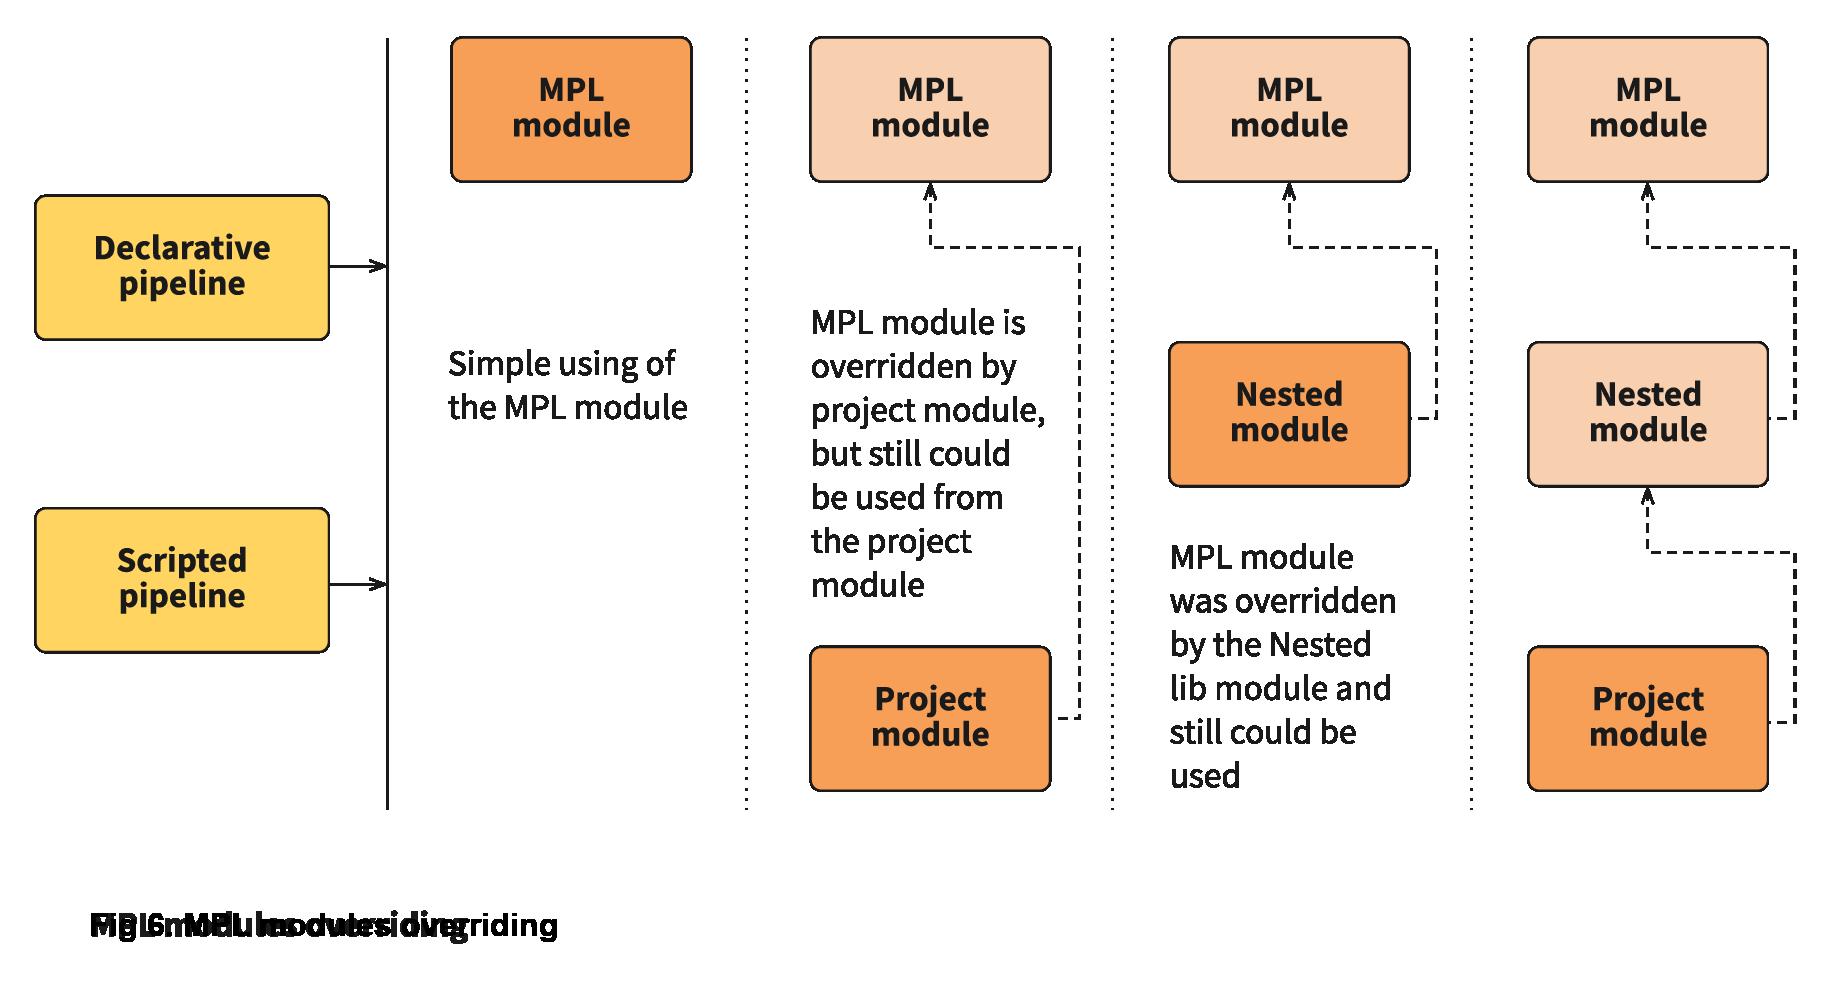 MPL modules overriding